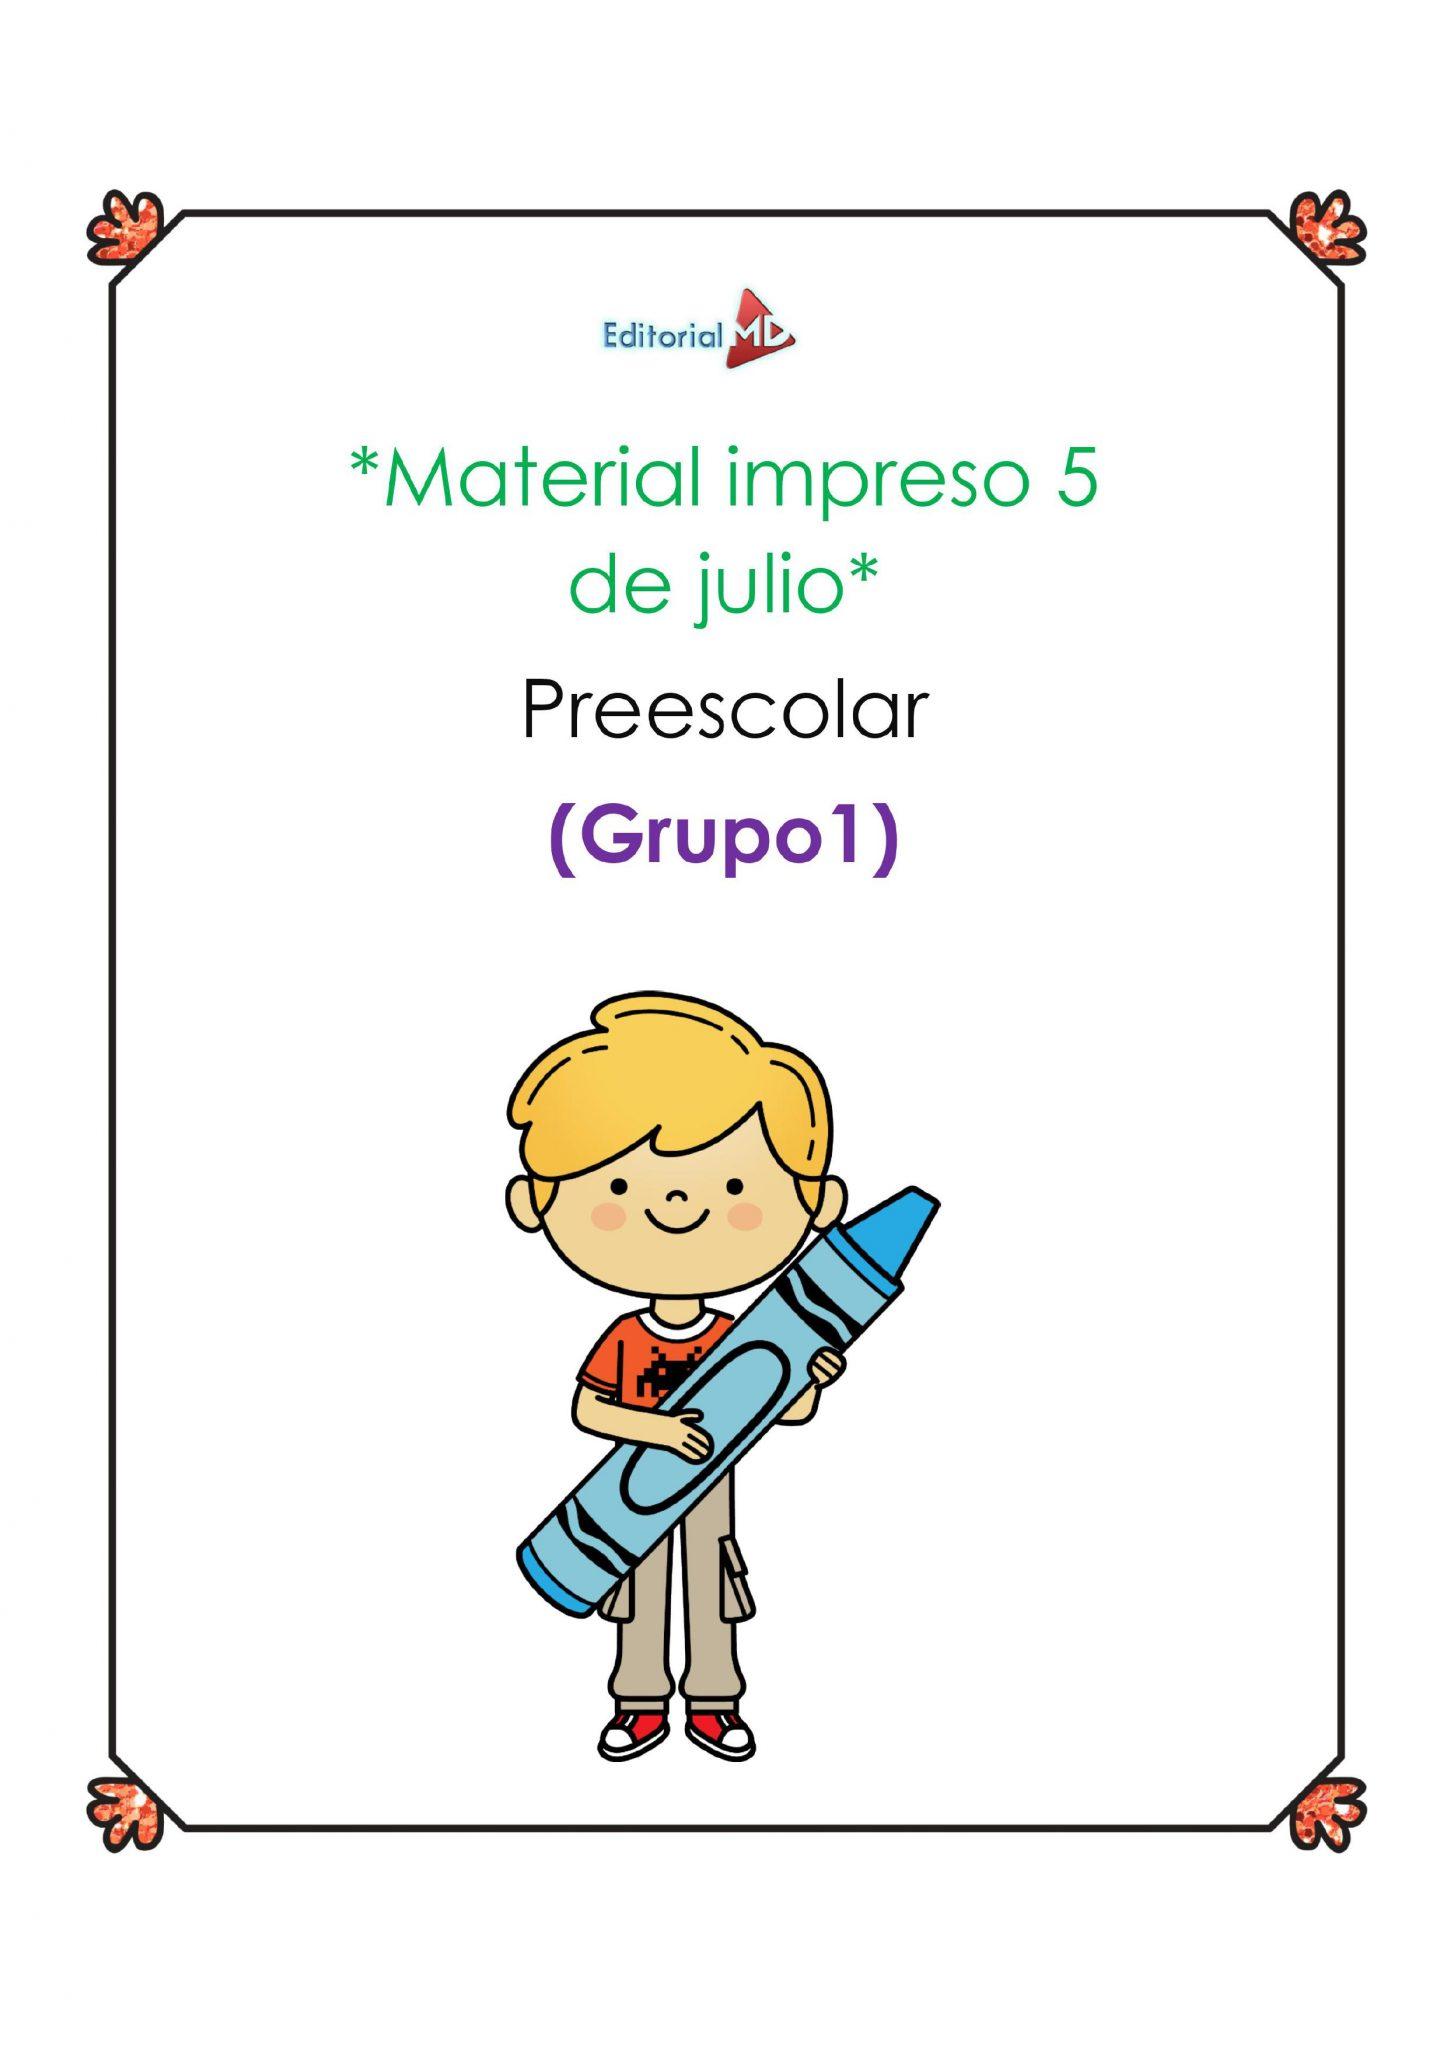 Ejemplo Material de apoyo semana 41 preescolar 01